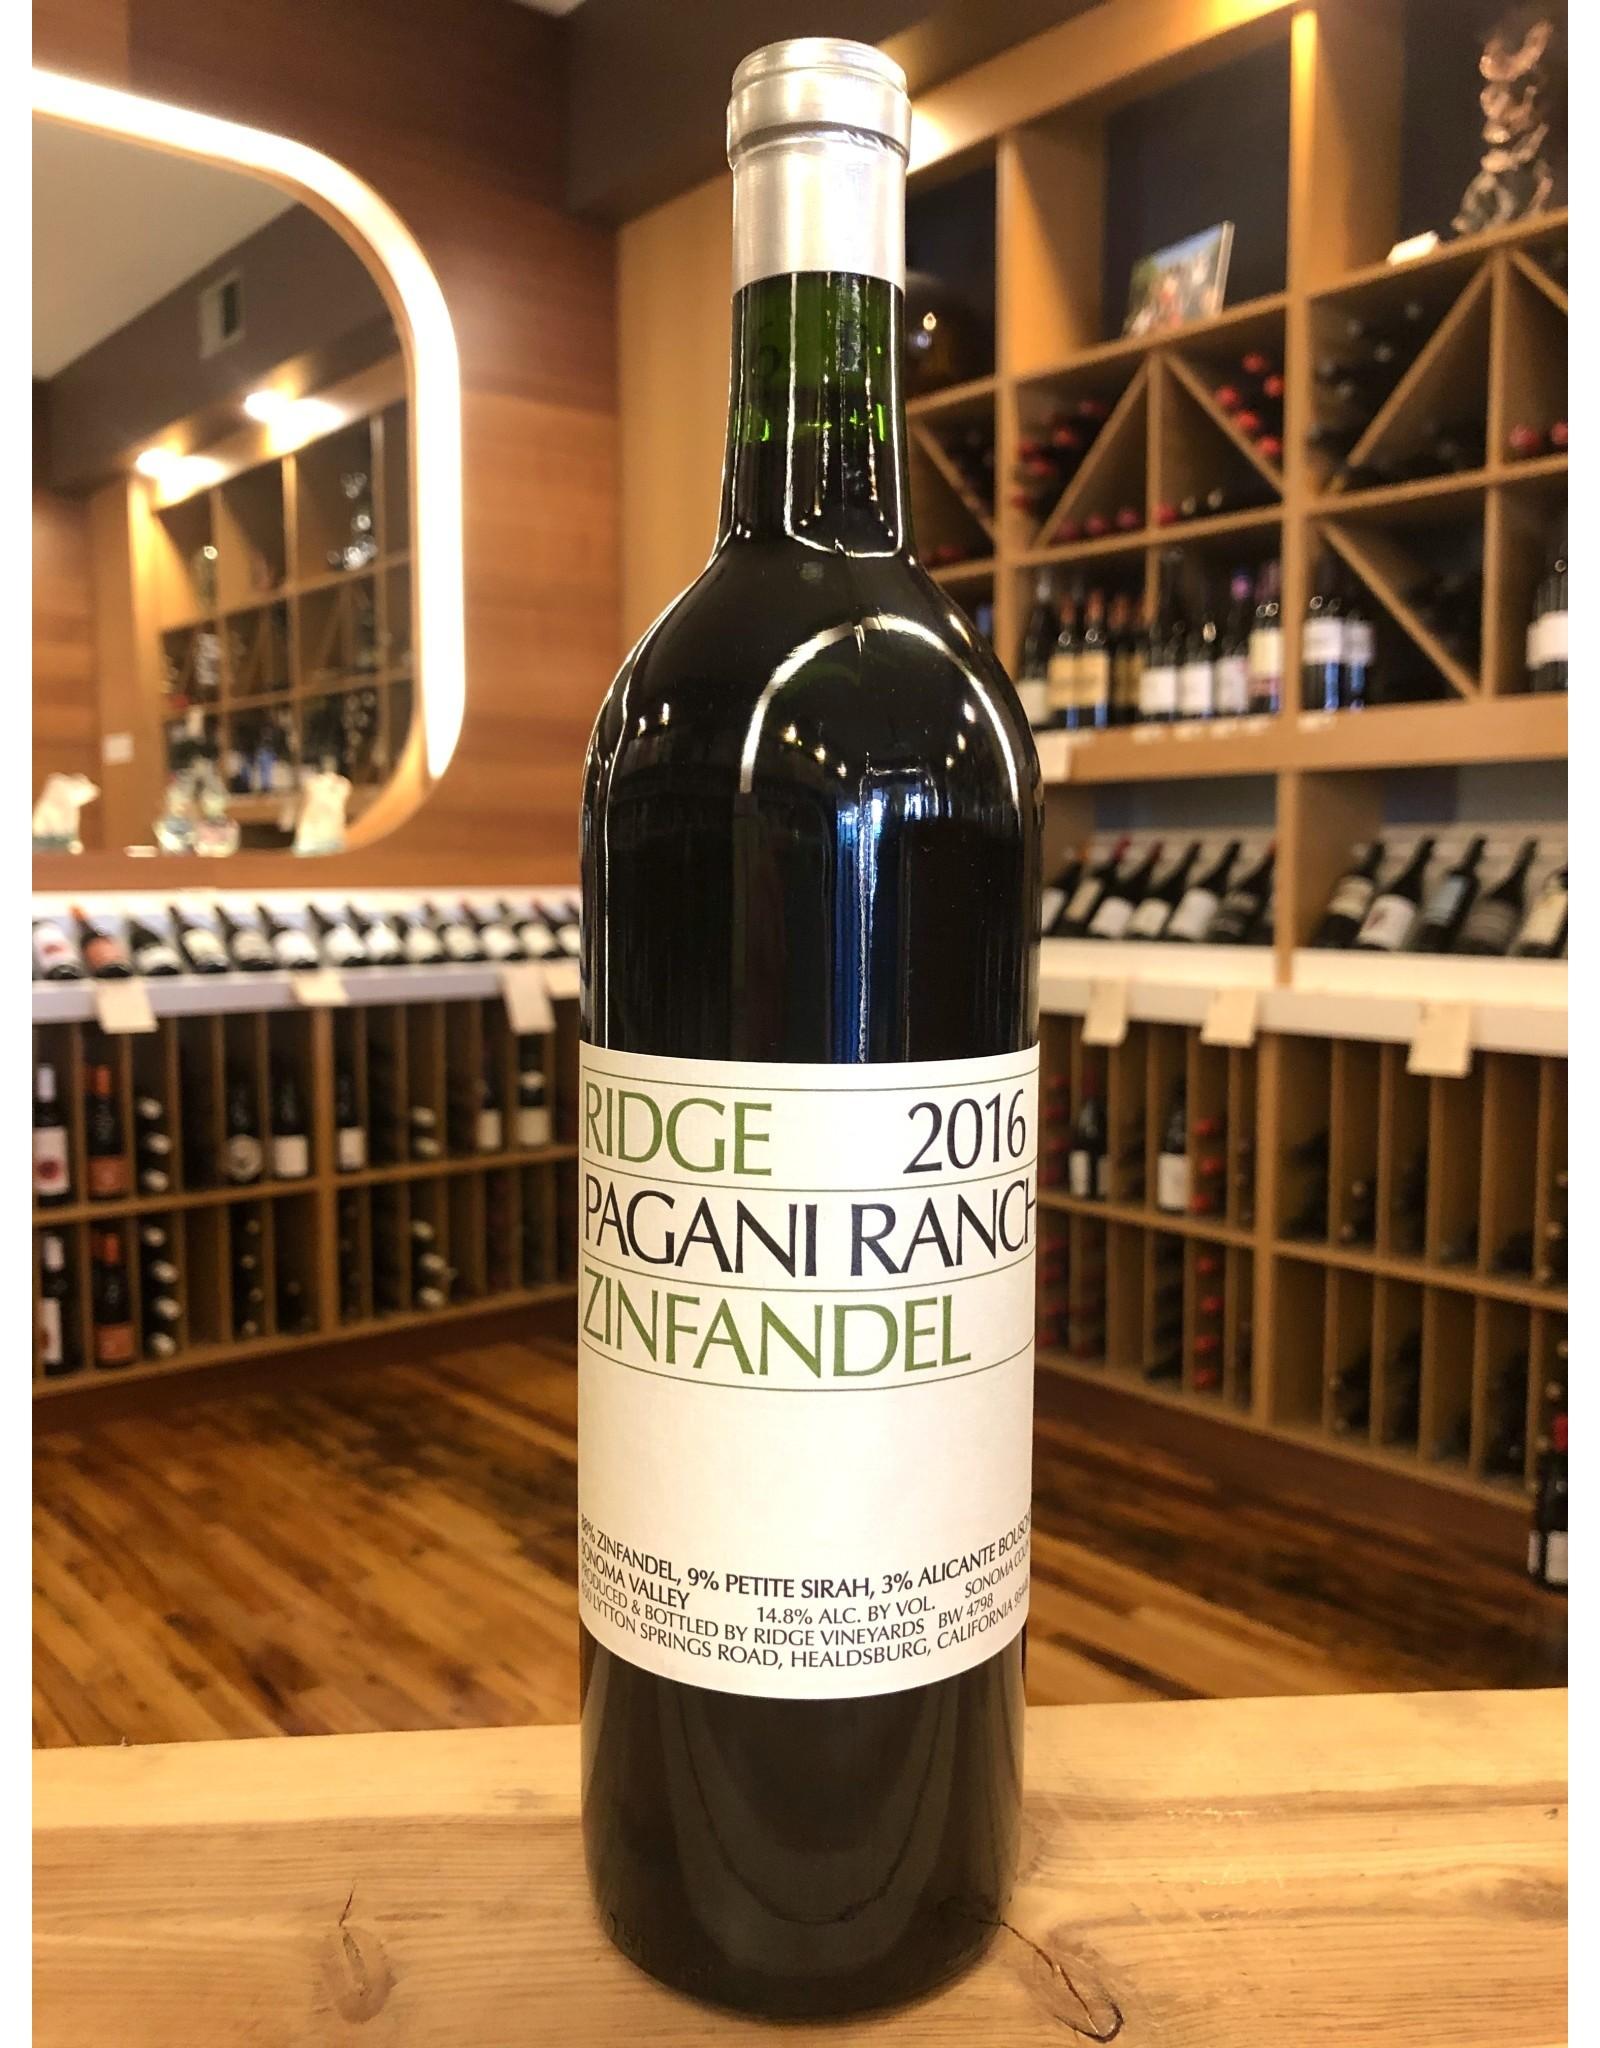 Ridge Pagani Ranch Zinfandel - 750 ML